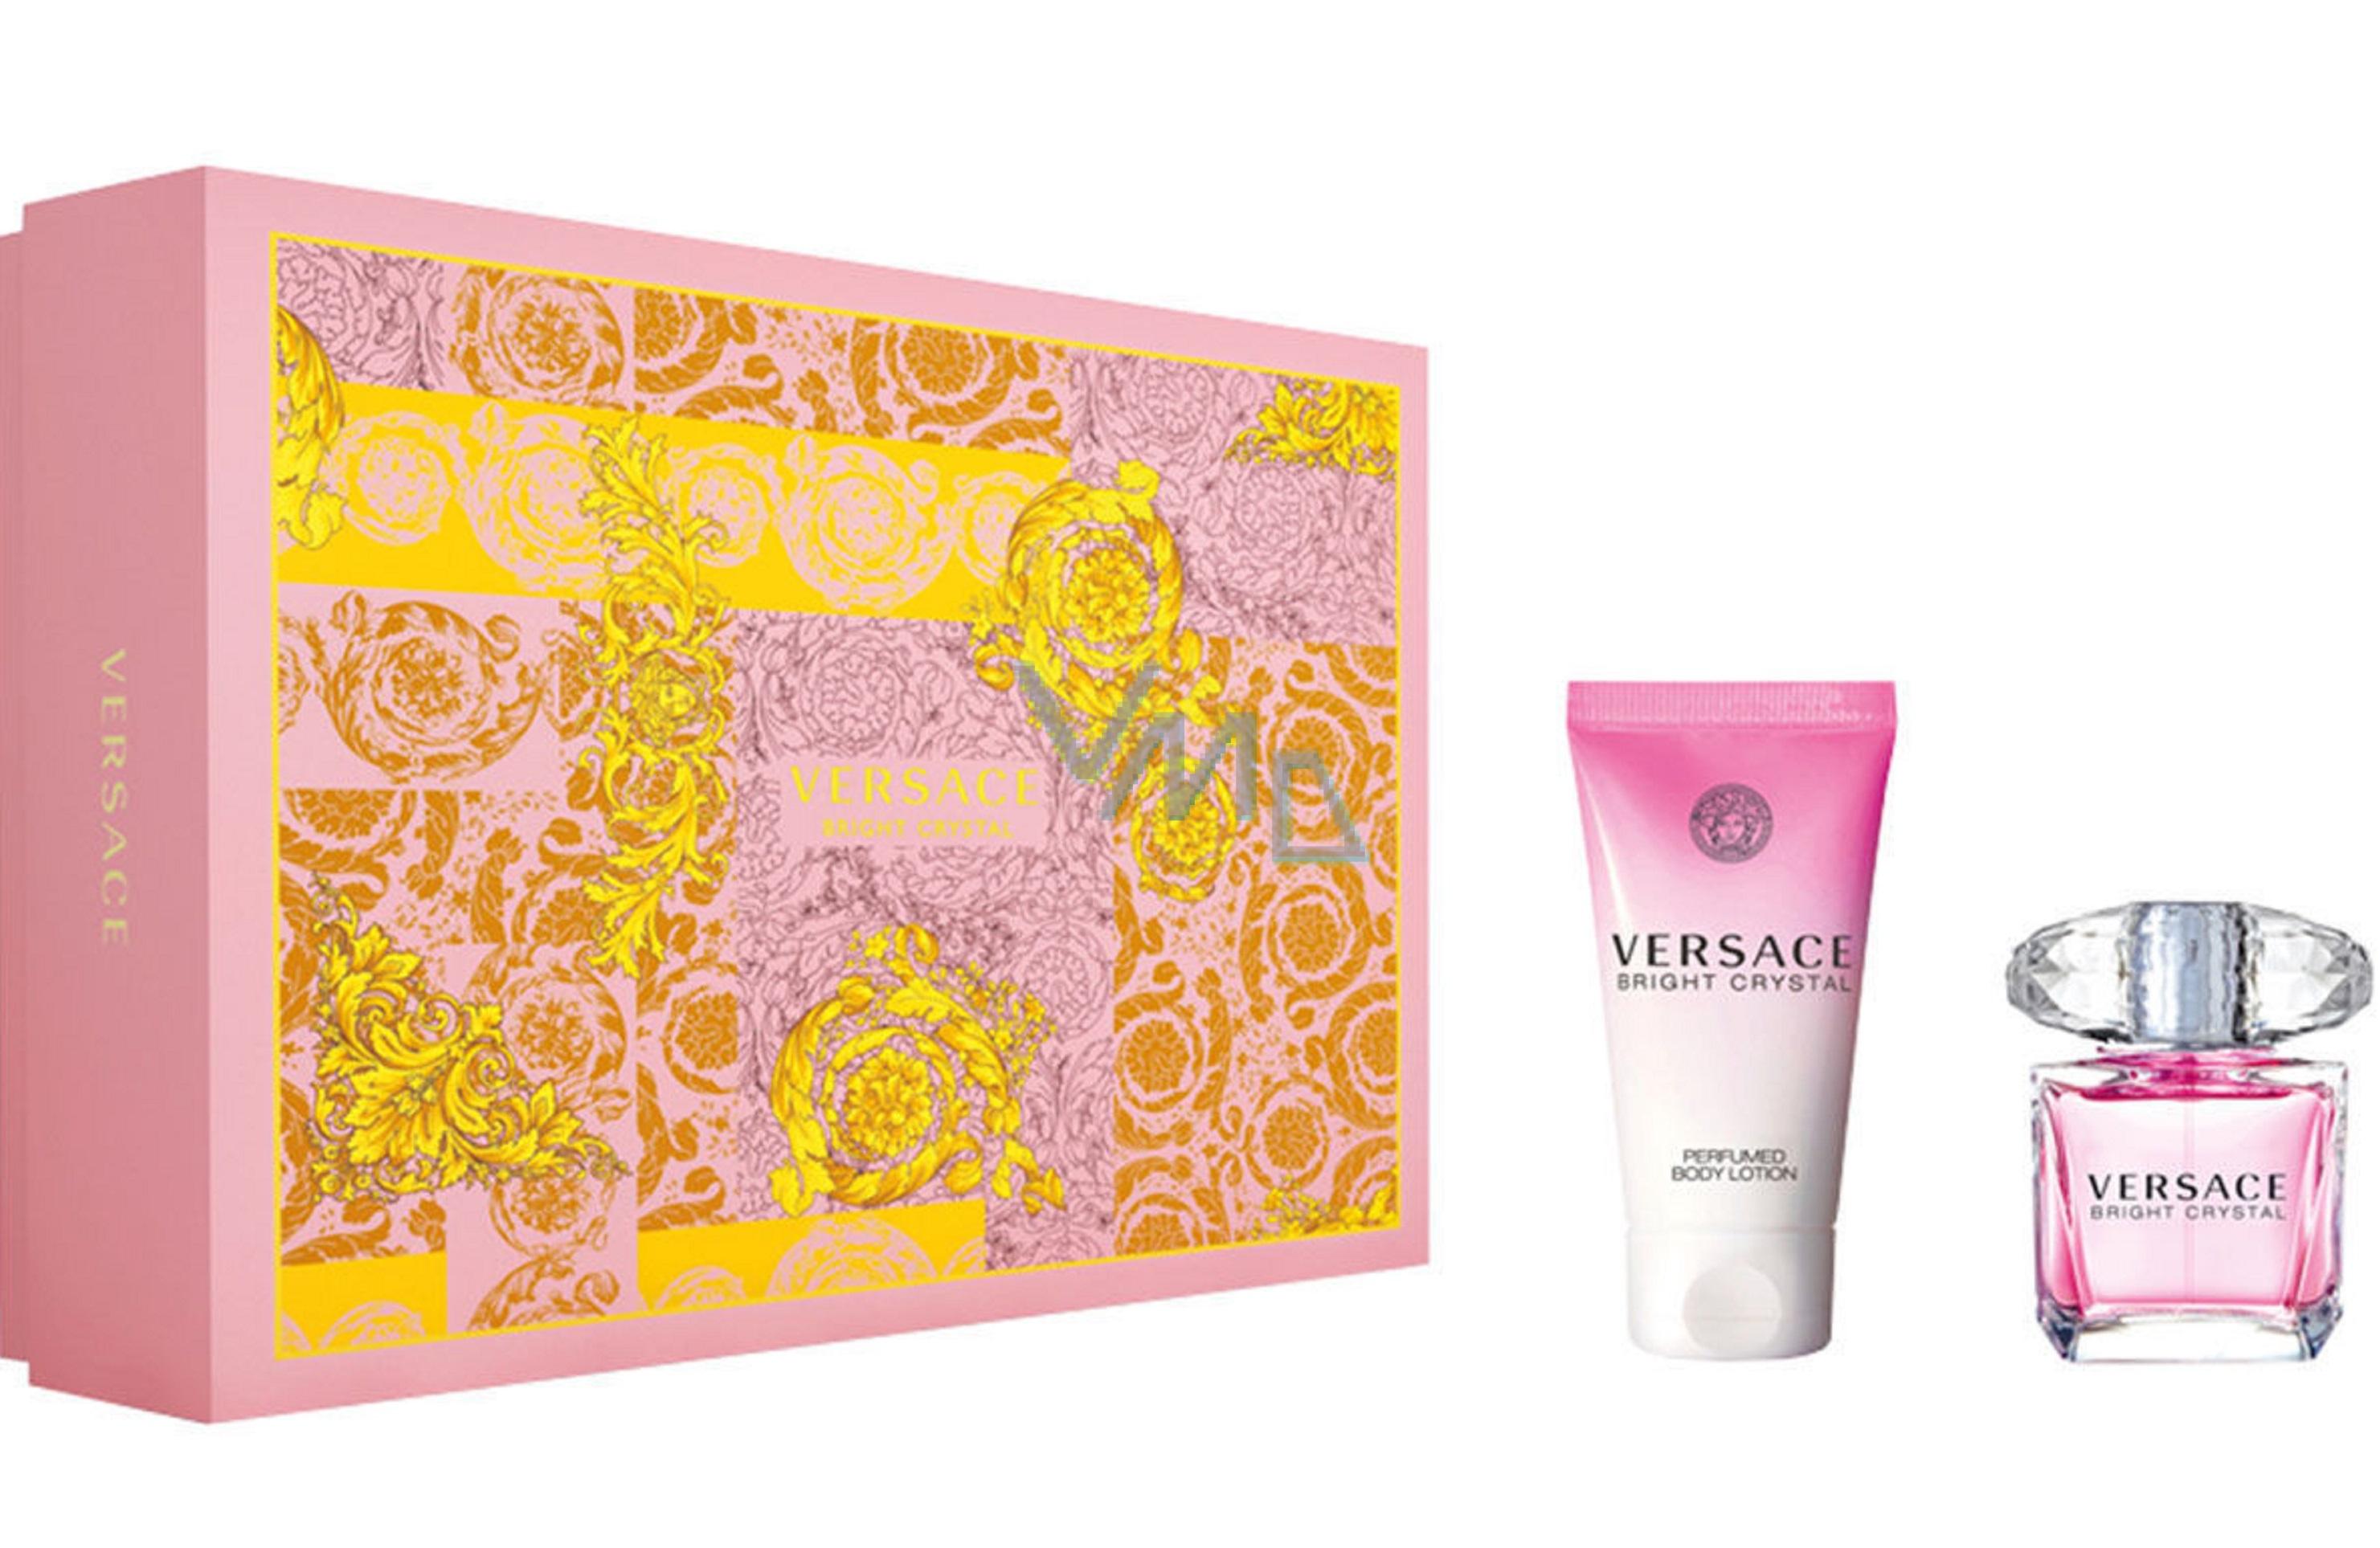 Versace Bright Crystal Eau de Toilette 30 ml + Body Lotion 50 ml, gift set